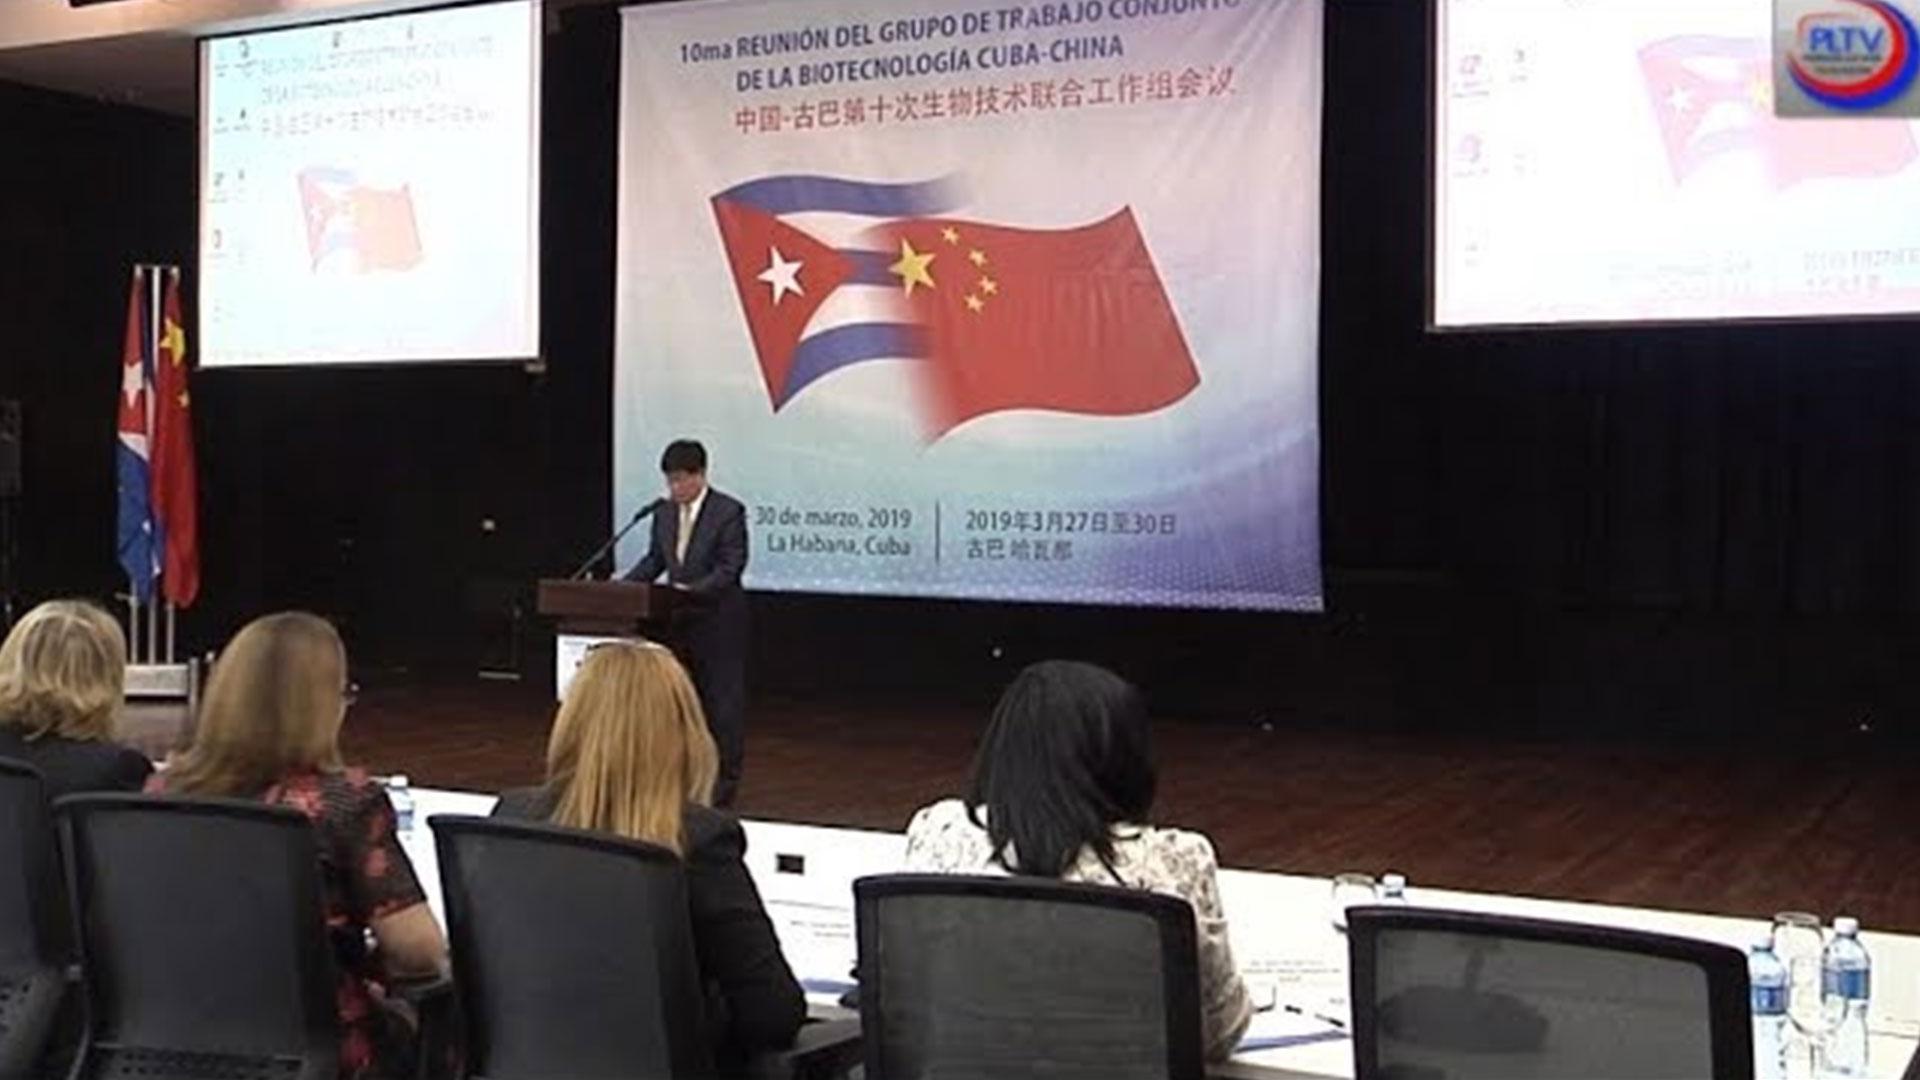 Cuba-empresas-chinas.jpg